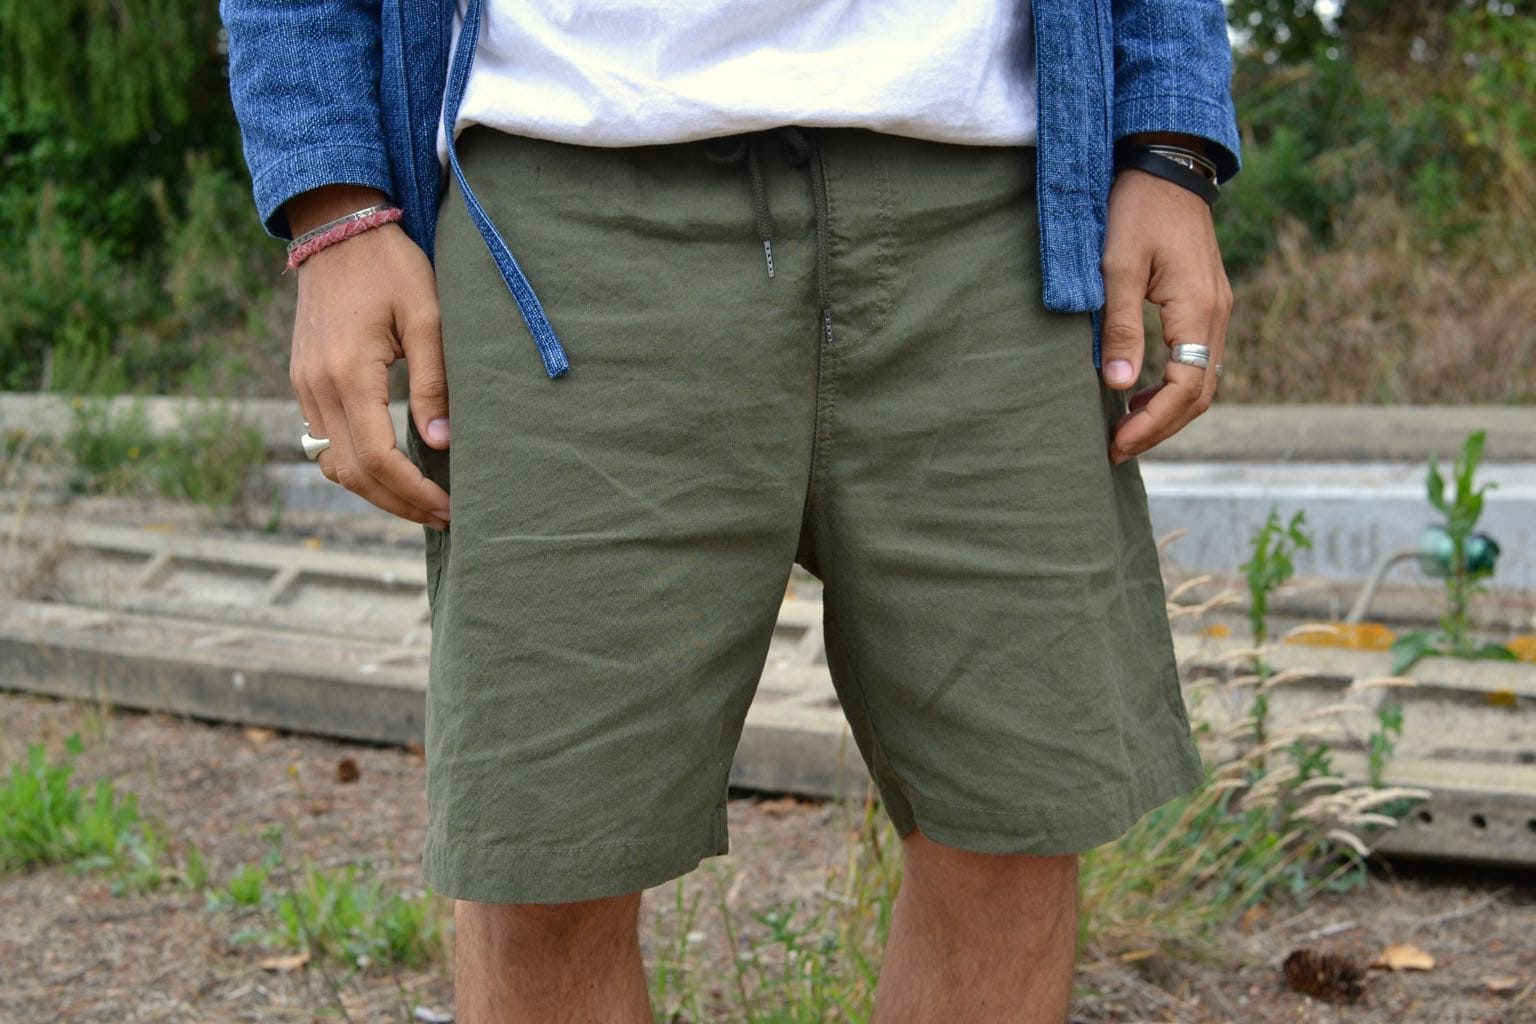 Drapeau Noir beach shorts seersucker - conseul homme été quel short choisir